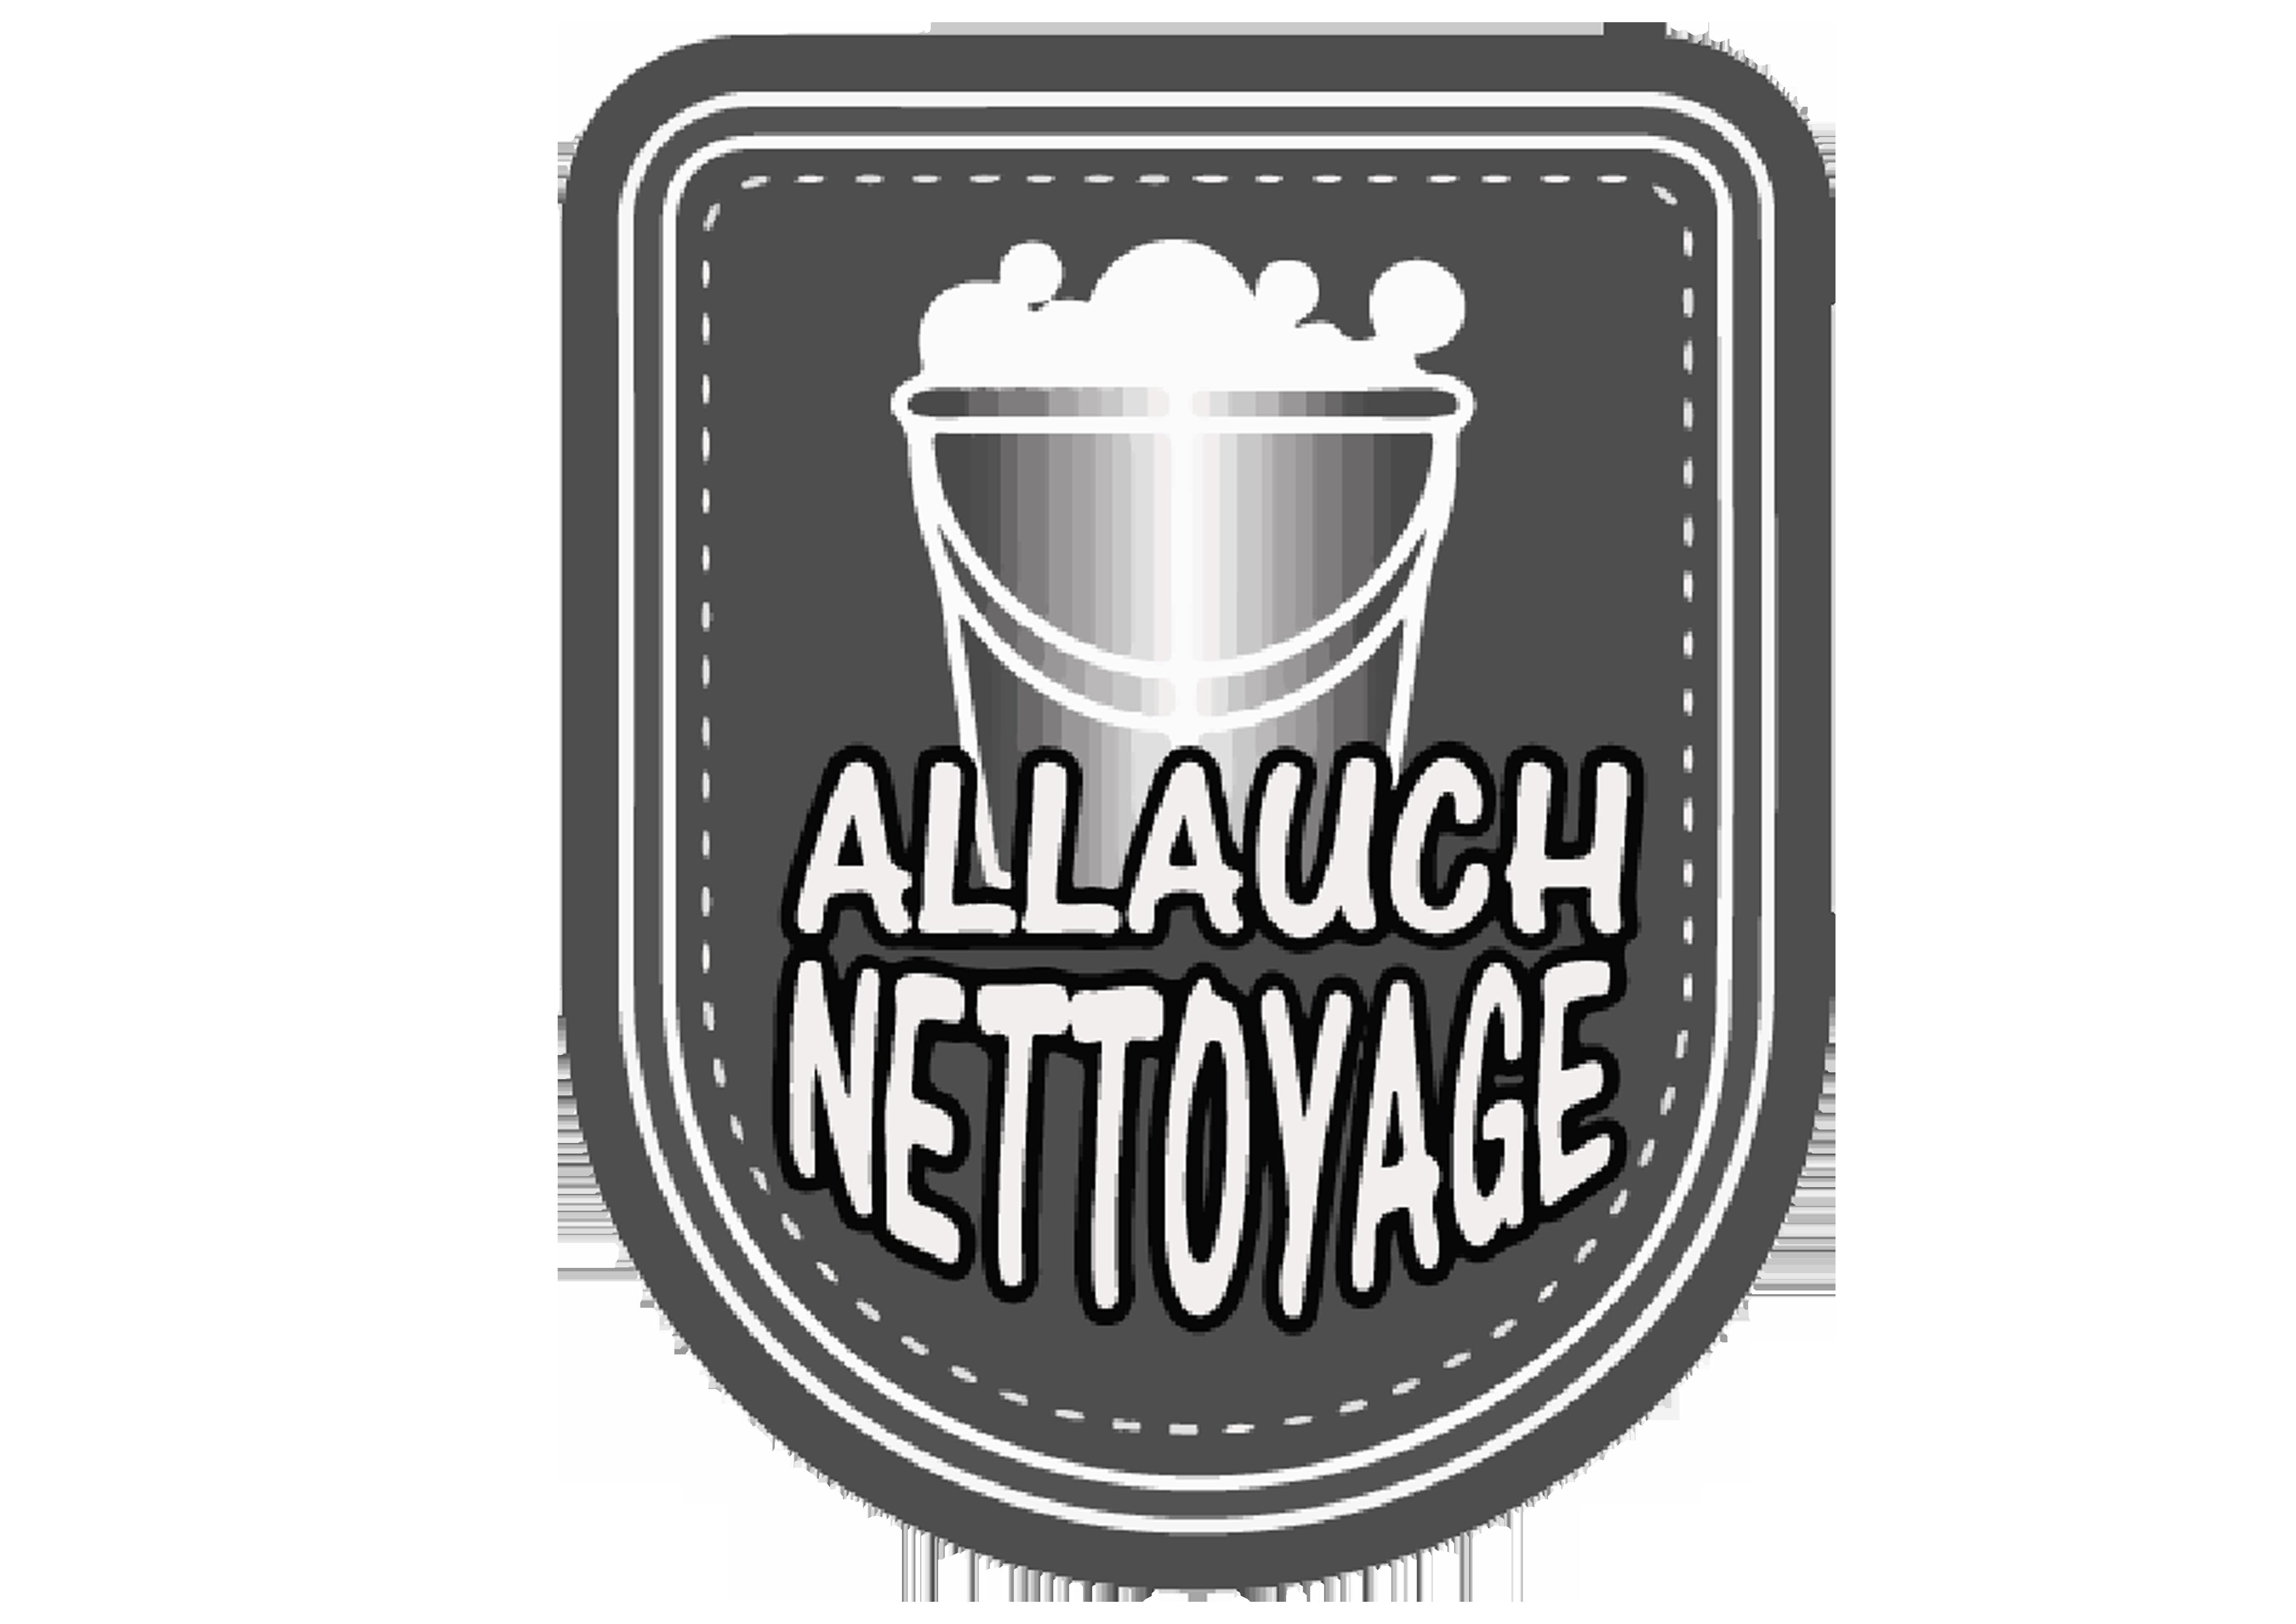 Allauch Nettoyage